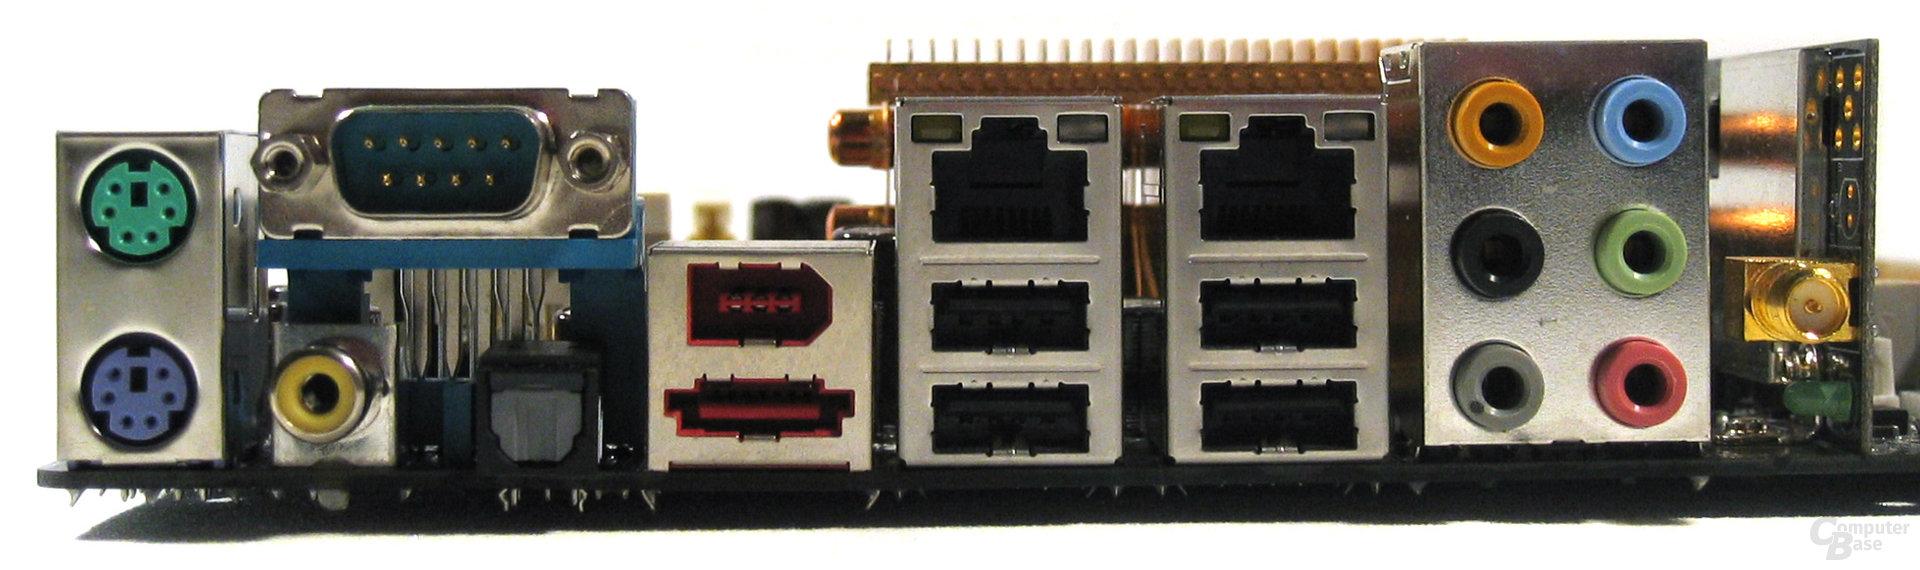 Asus M2N32-SLI Deluxe ATX-Blende